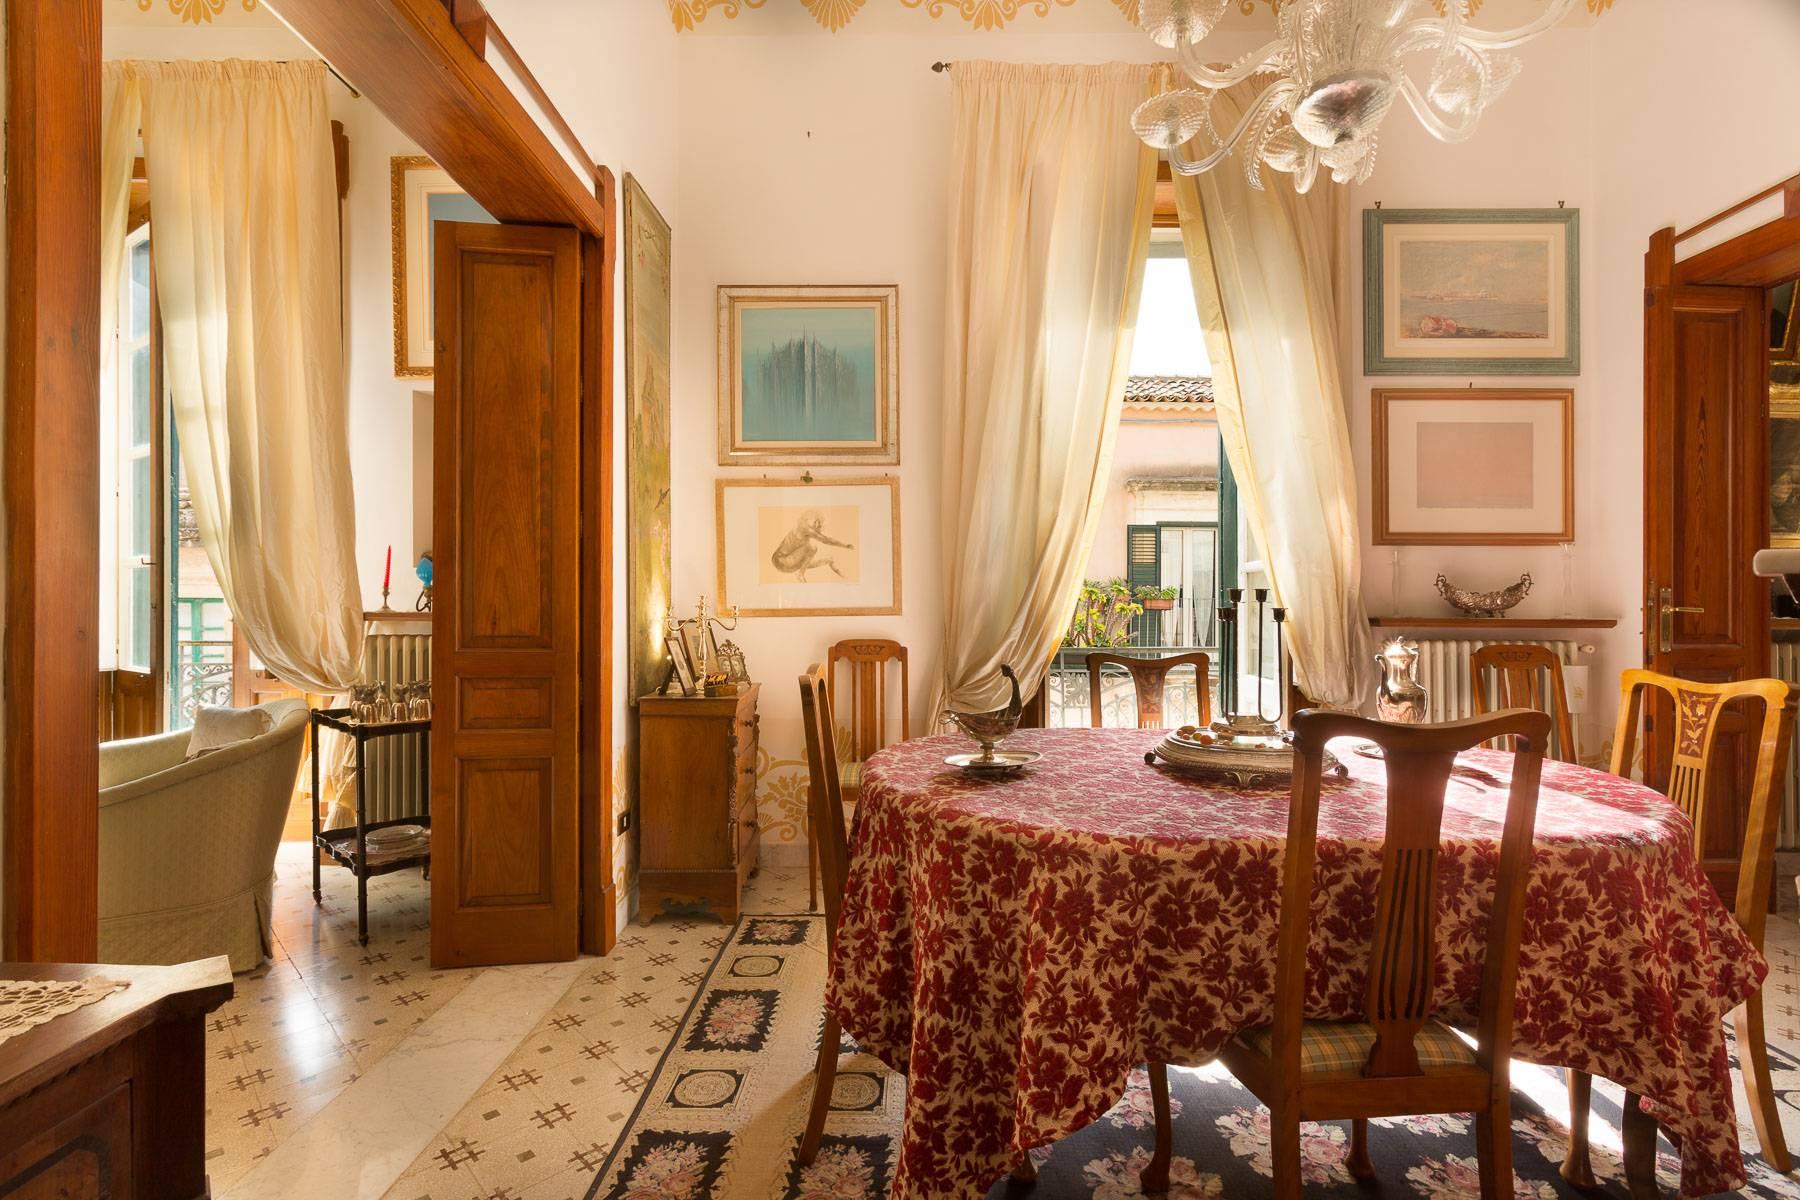 Casa indipendente in Vendita a Noto: 5 locali, 280 mq - Foto 11